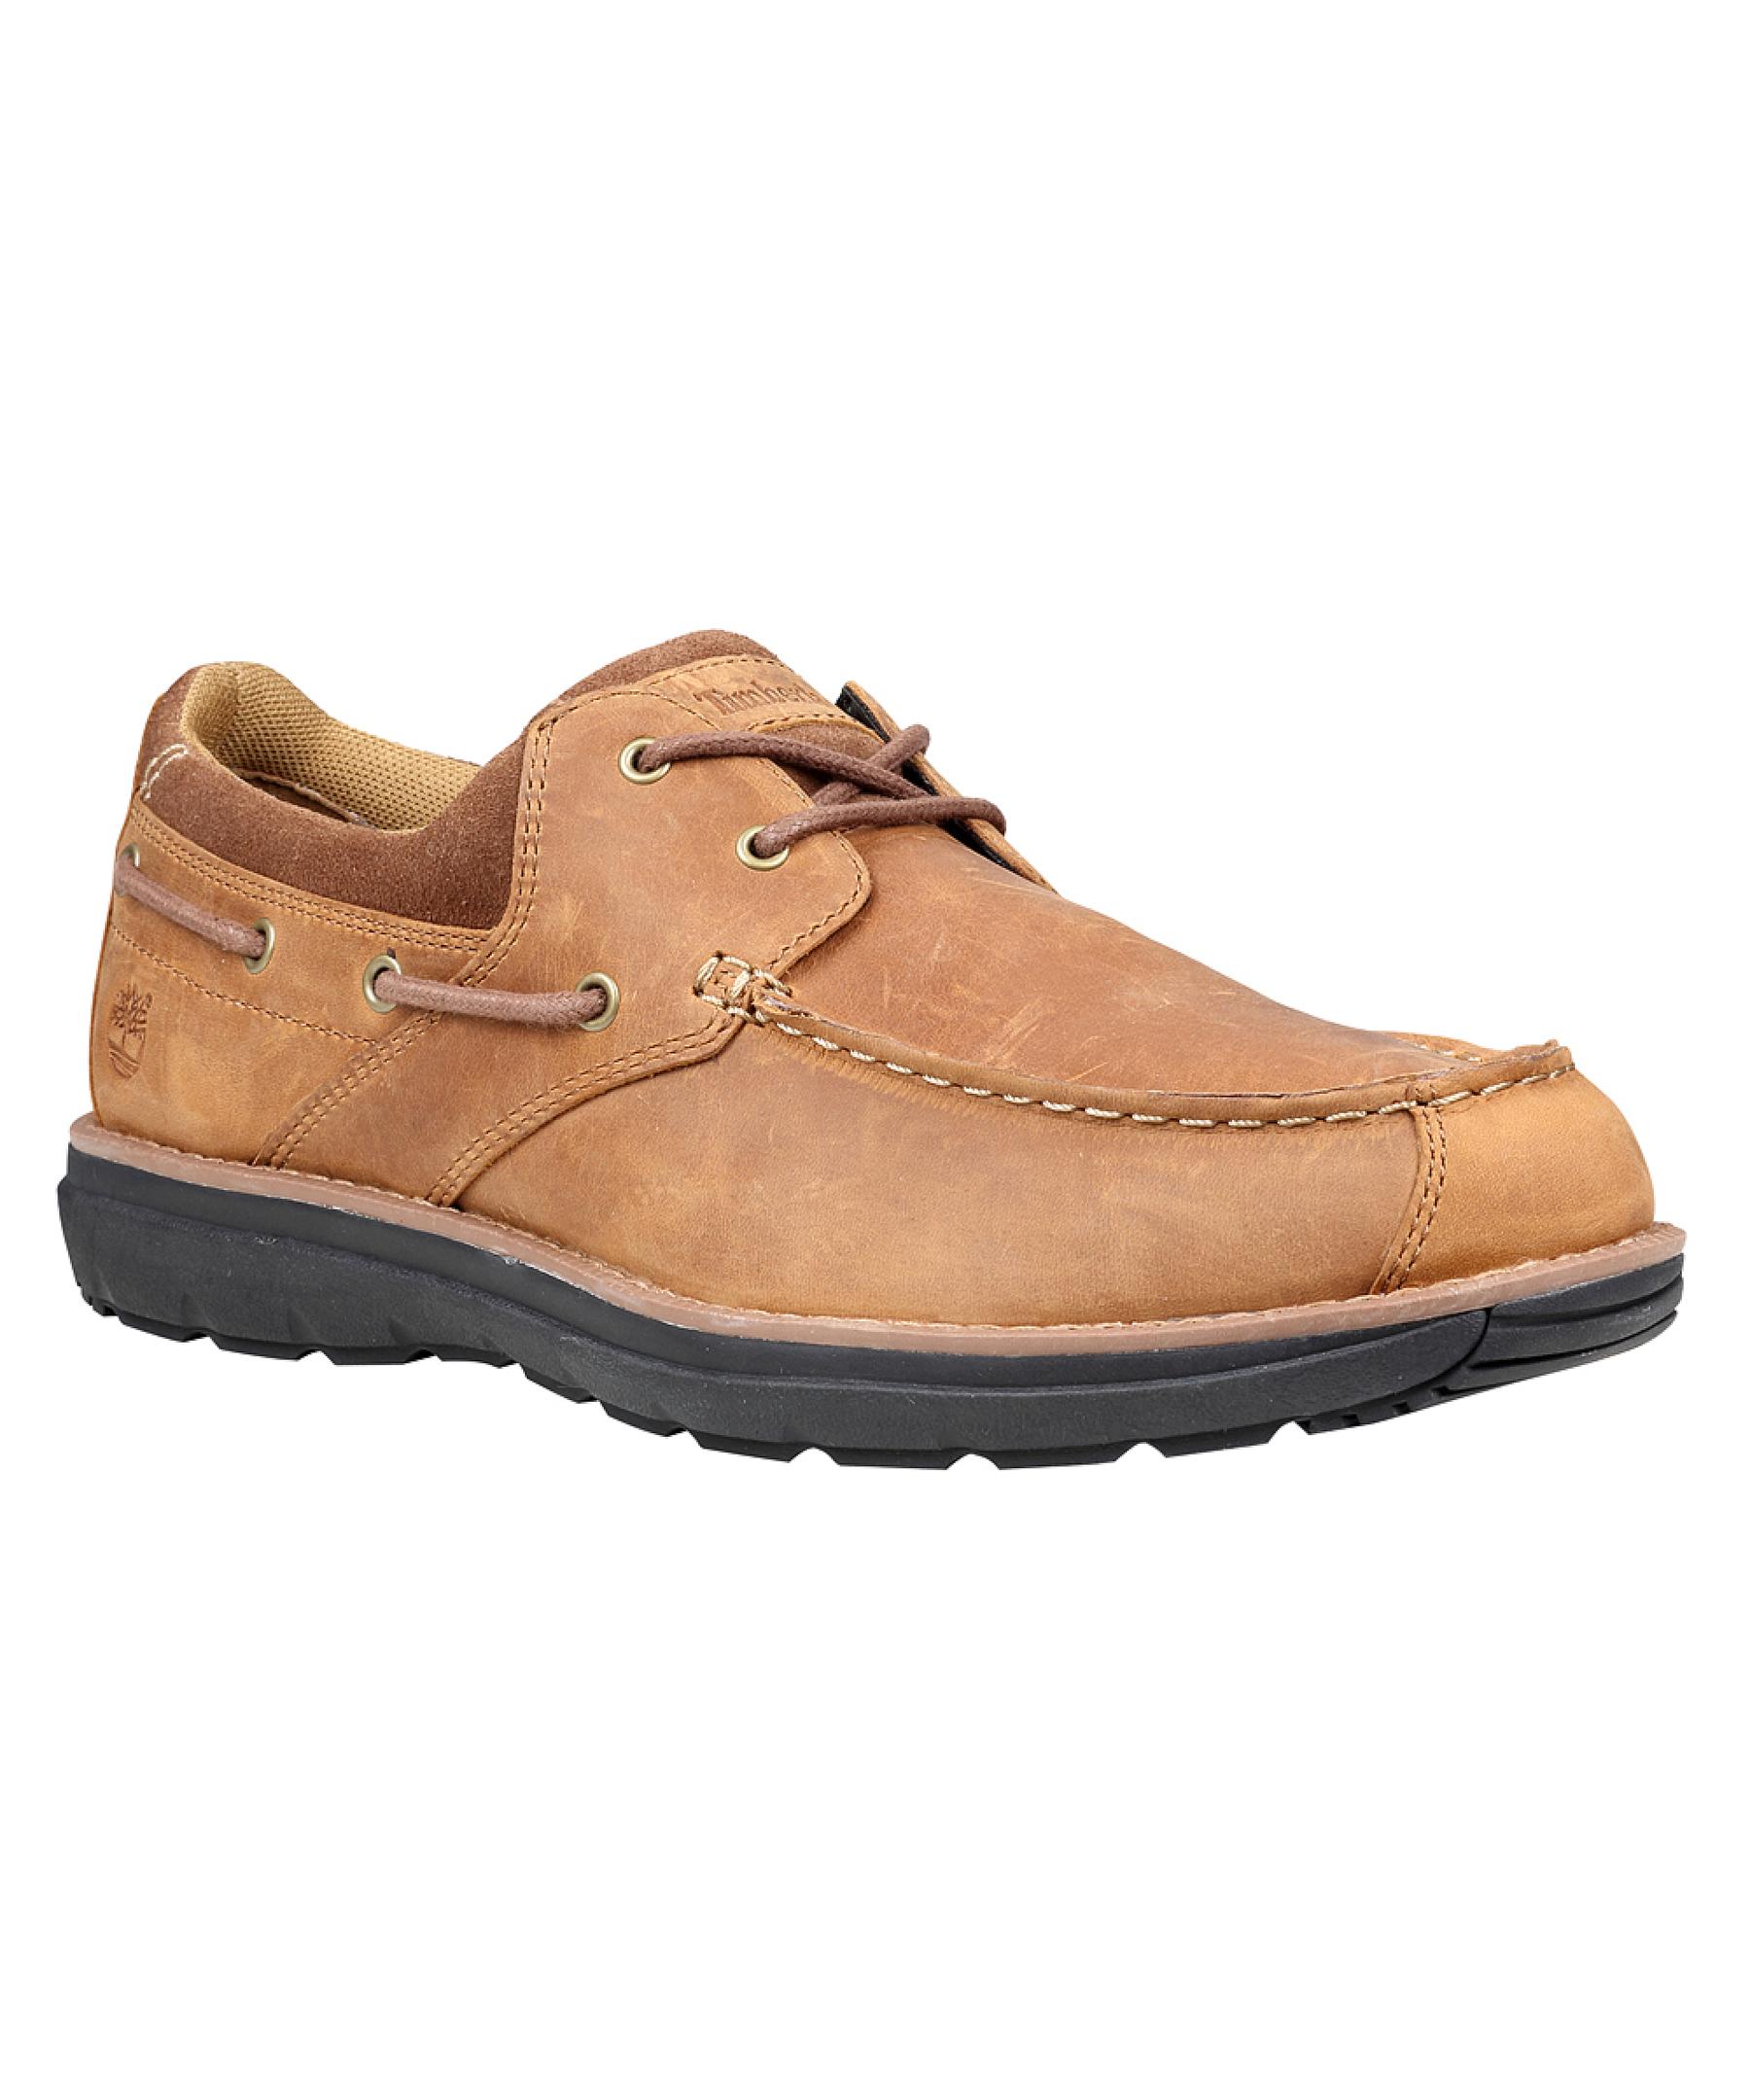 Timberland Menu0026#39;s Barrett Park 2-eye Boat Athletic Boating Shoes In Beige For Men | Lyst